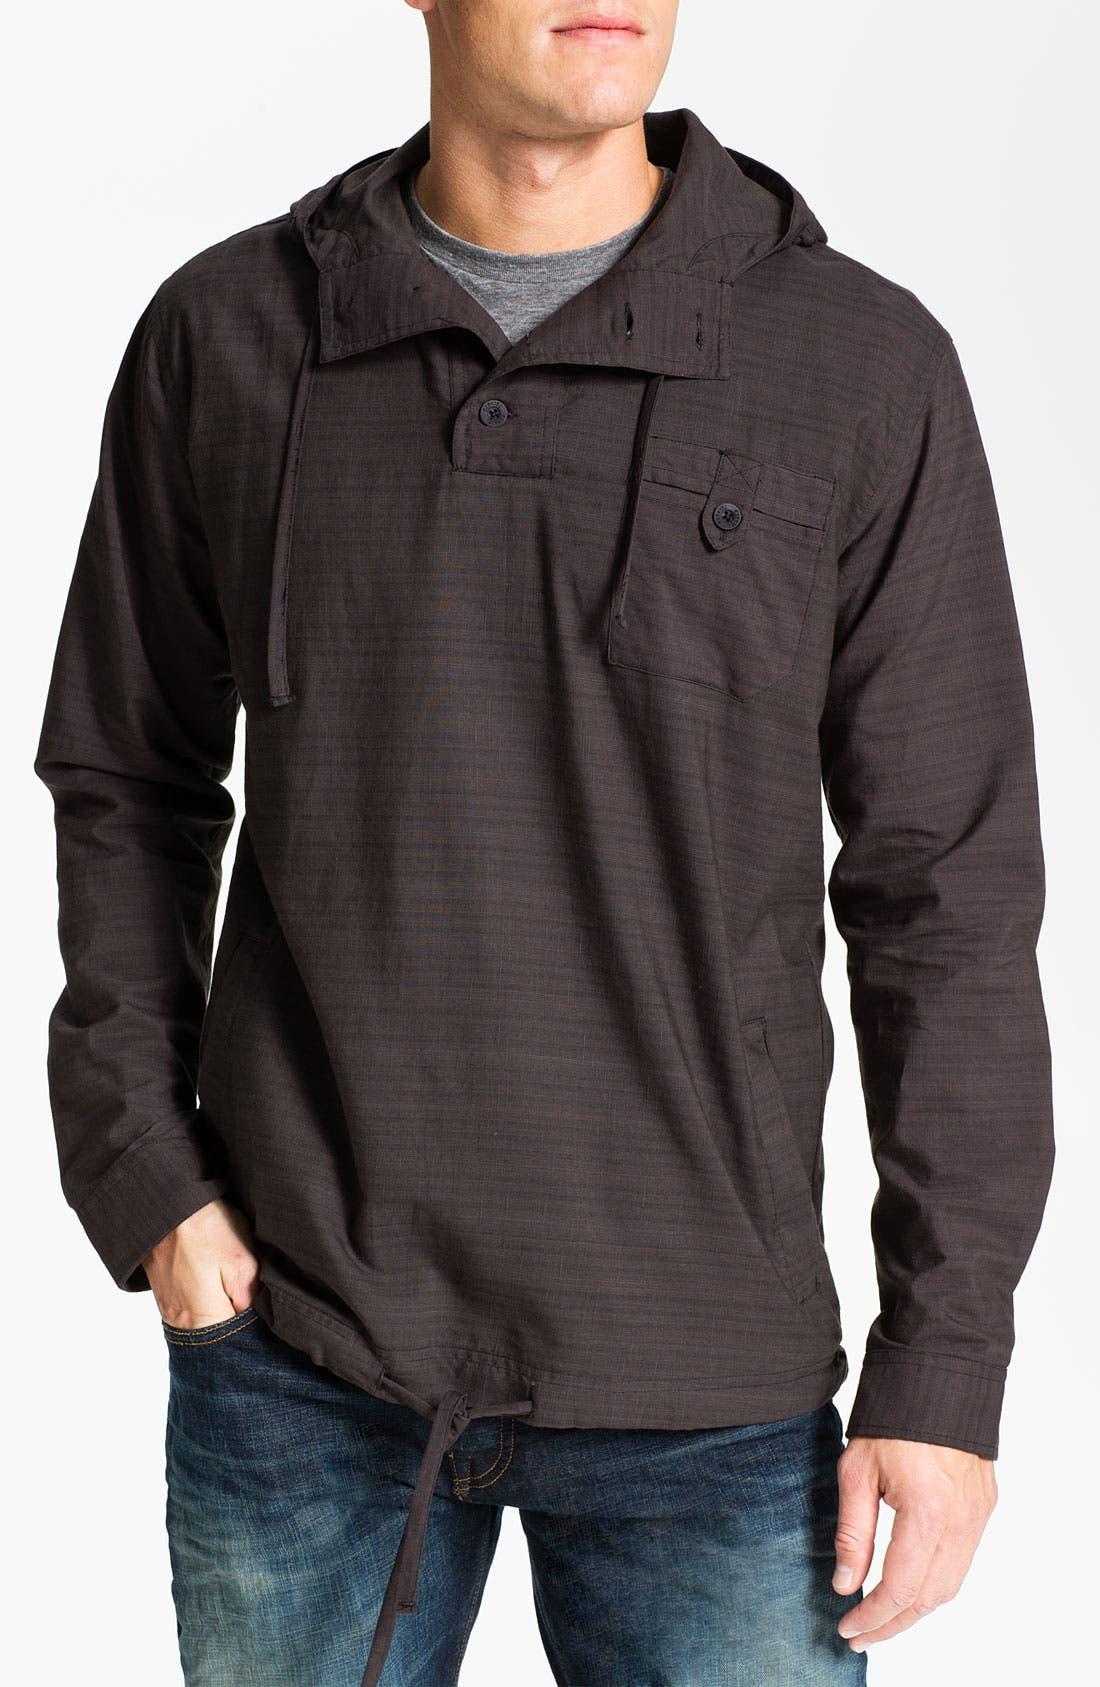 Main Image - Ezekiel 'Cedar' Hooded Woven Pullover